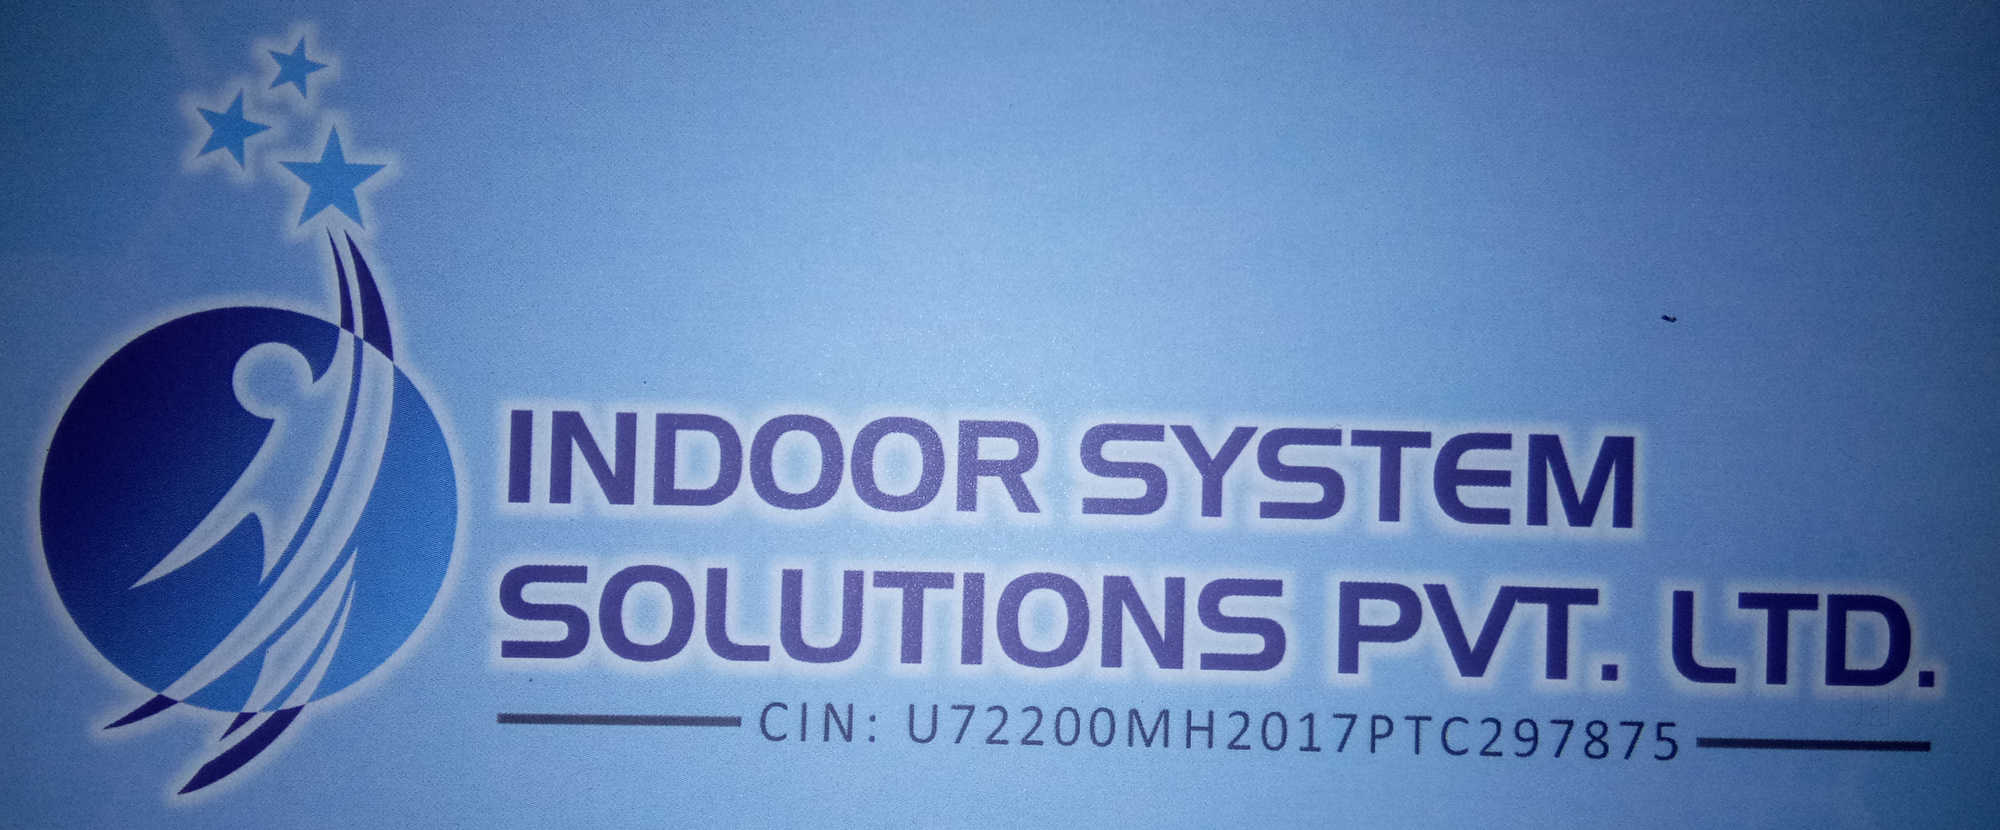 Indoor System Solution Pvt. Ltd.